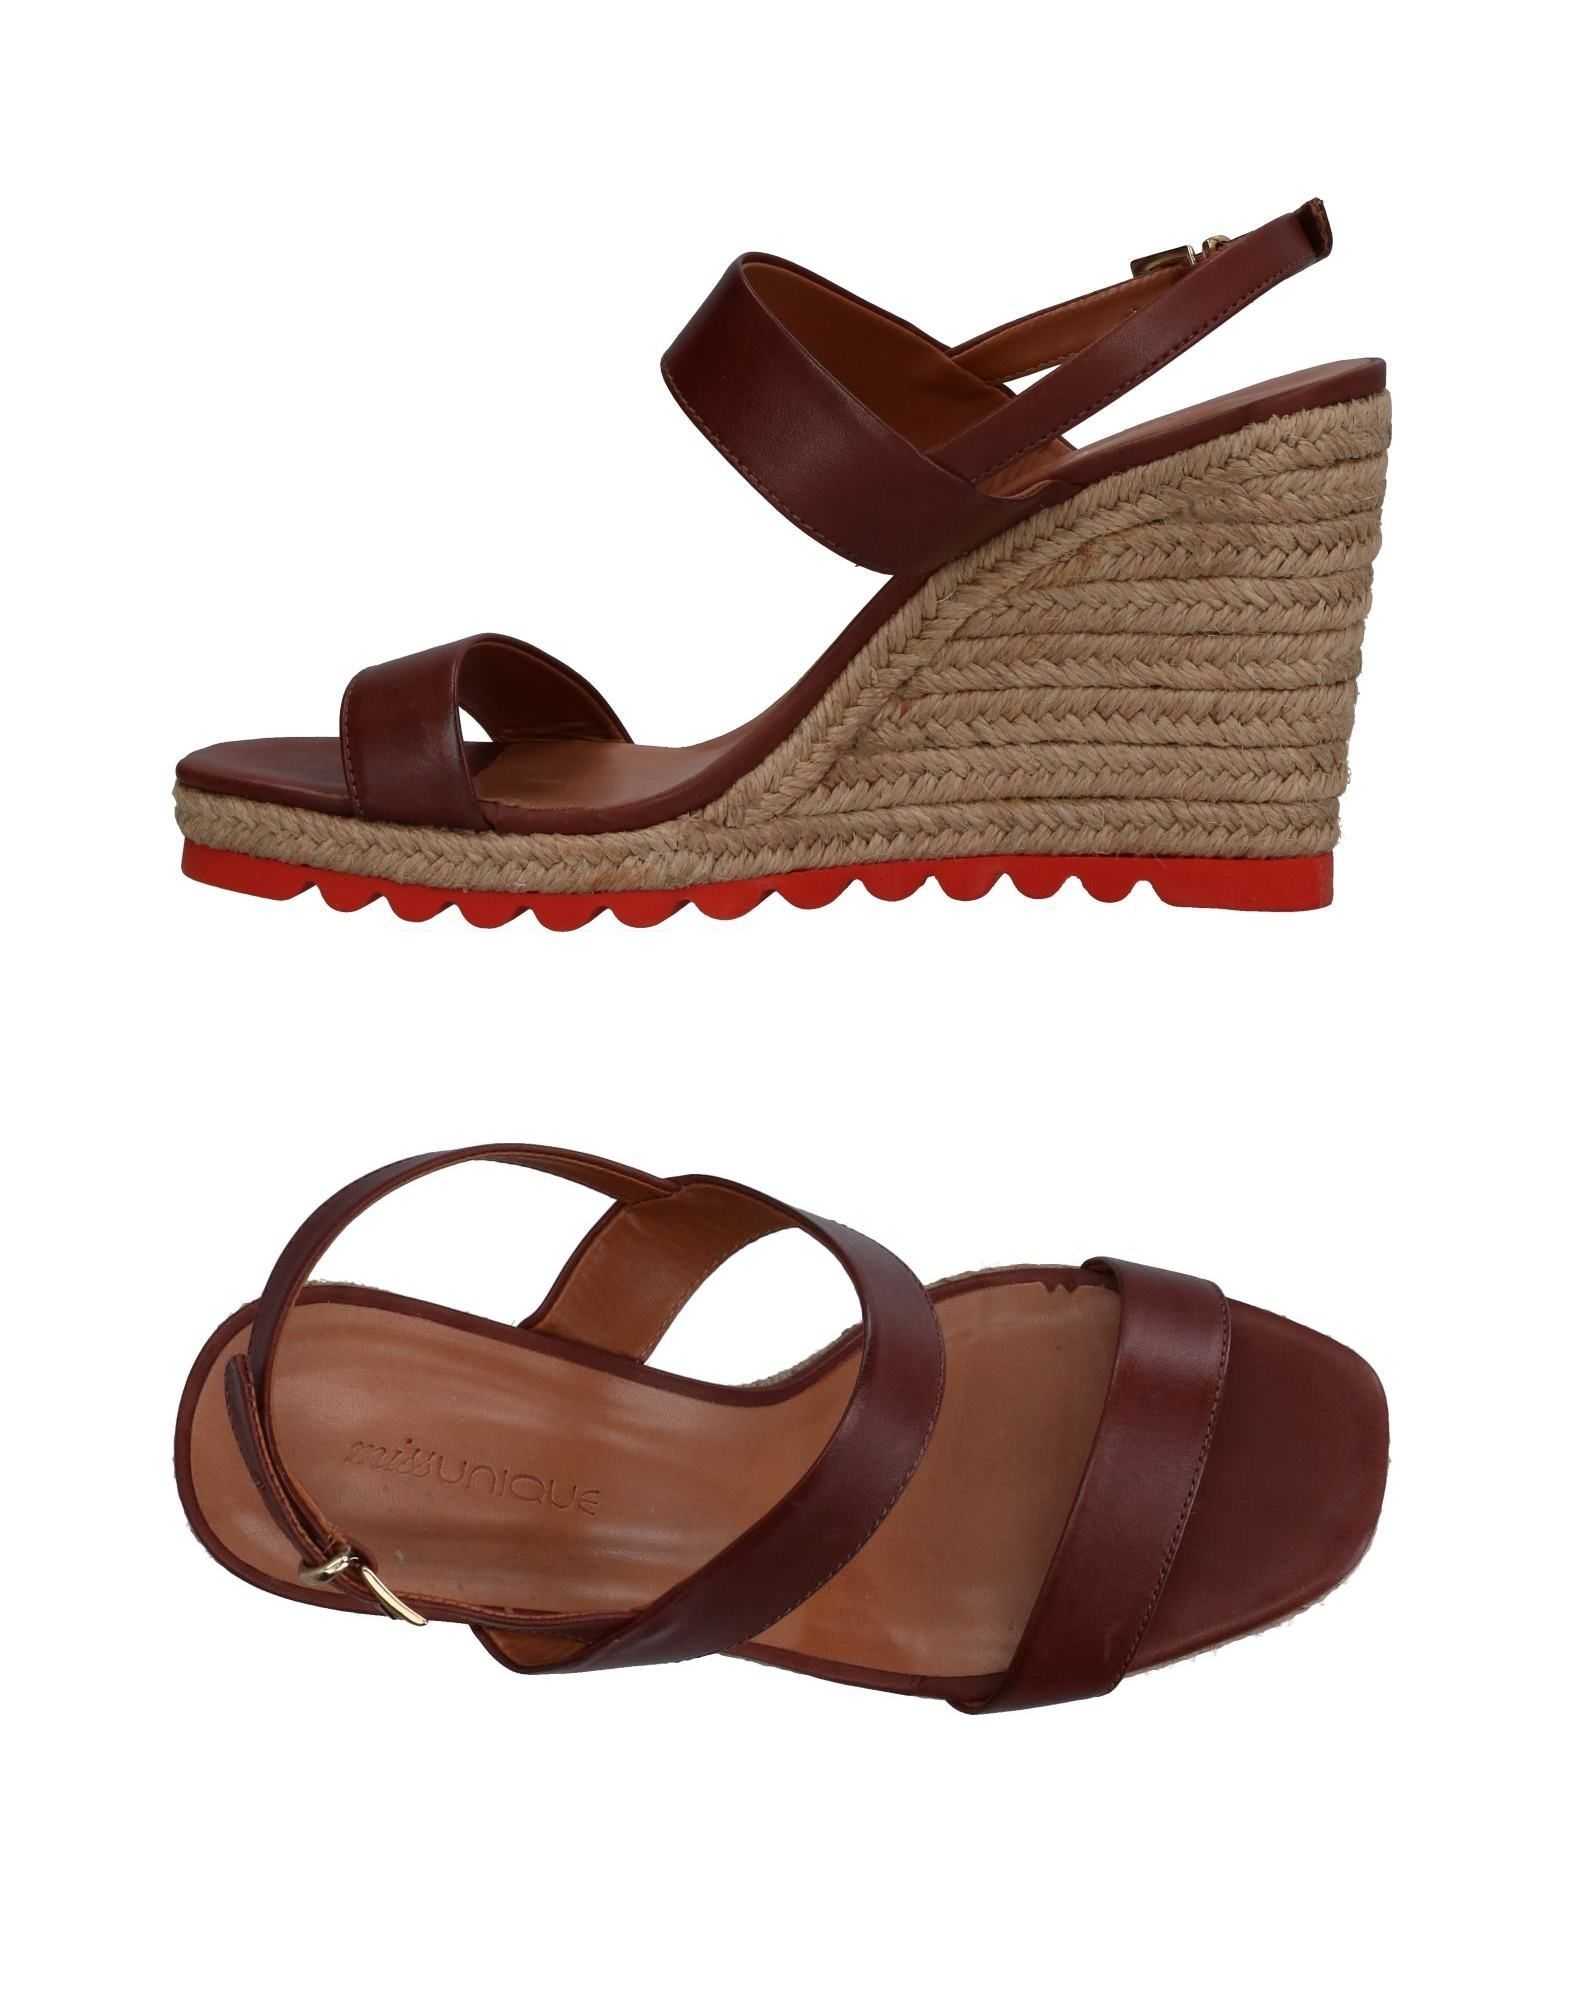 Chaussures - Sandales Post Orteils Vittorio De Virgili sey58